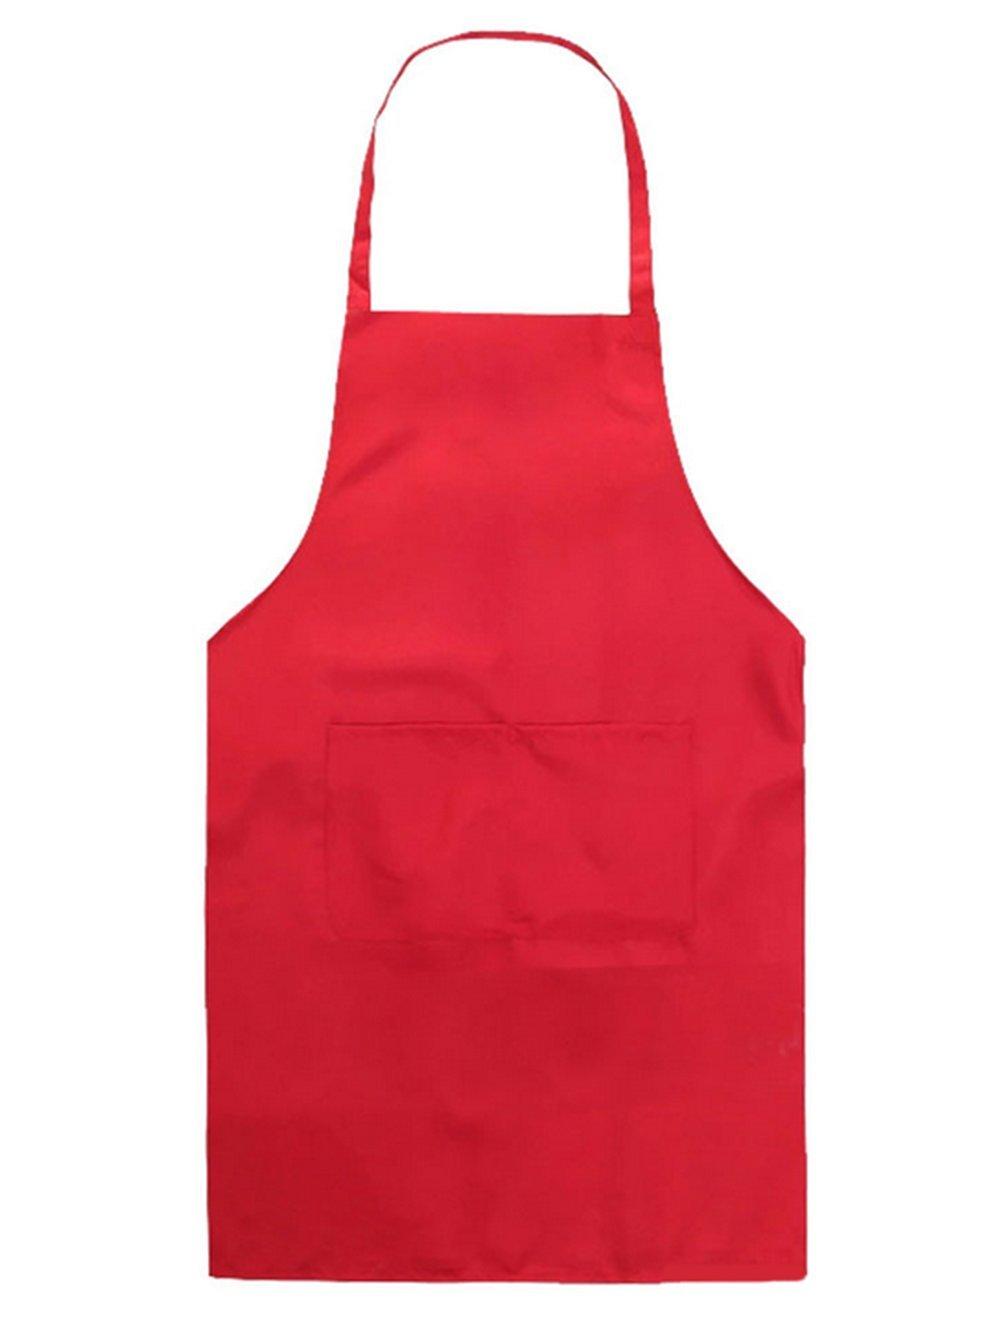 WeiMay Children Kids Apron Pocket Craft Cooking Baking Art Painting Apron for Home/Classroom/Kitchen/Kindergarten, 1pc(Black)